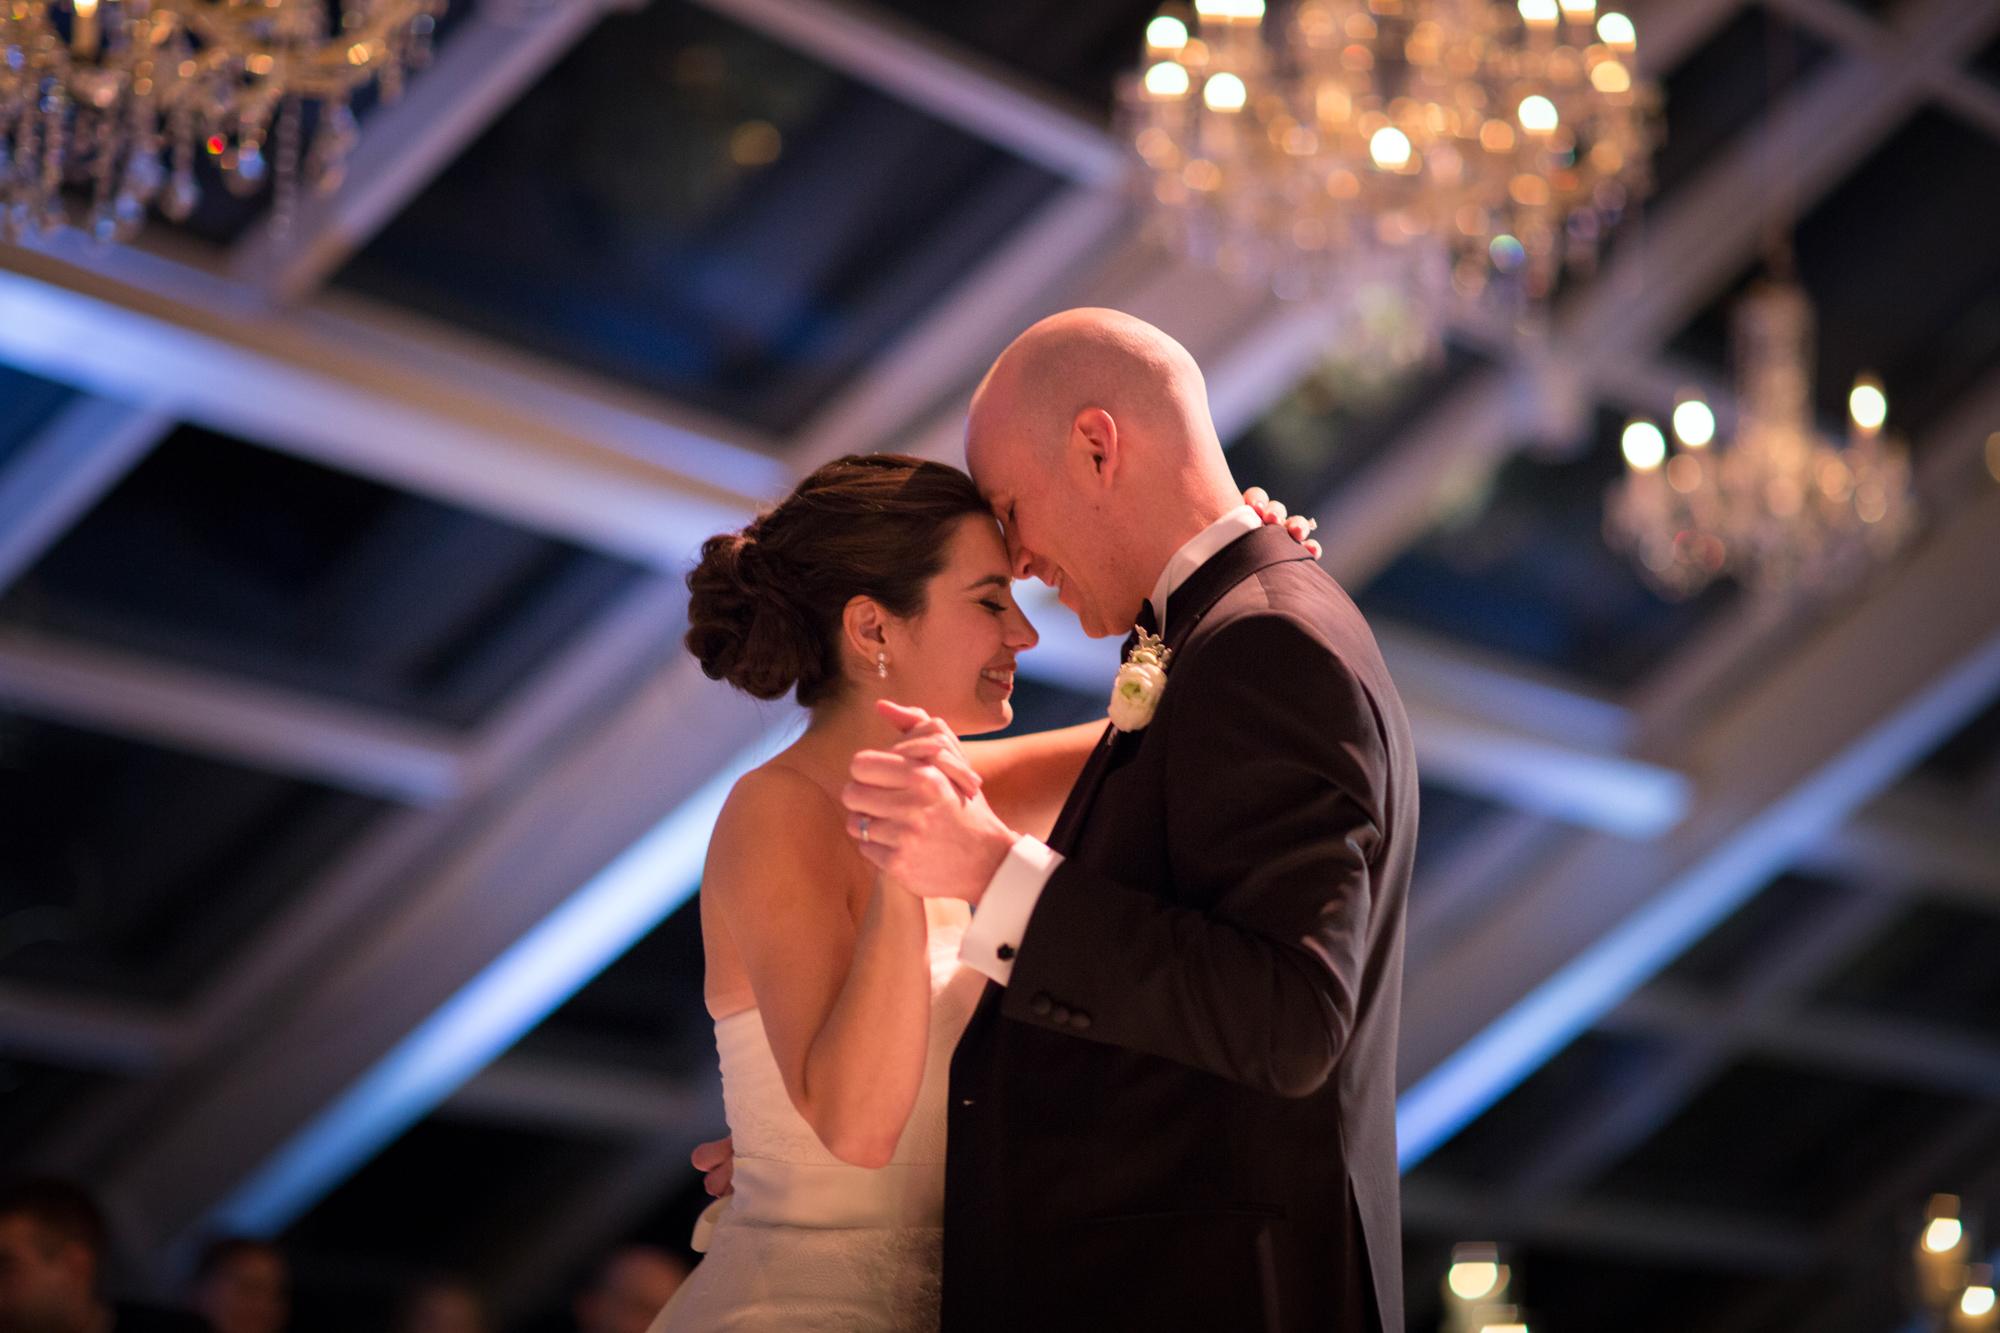 Bride and groom dance at Adler Planetarium wedding.